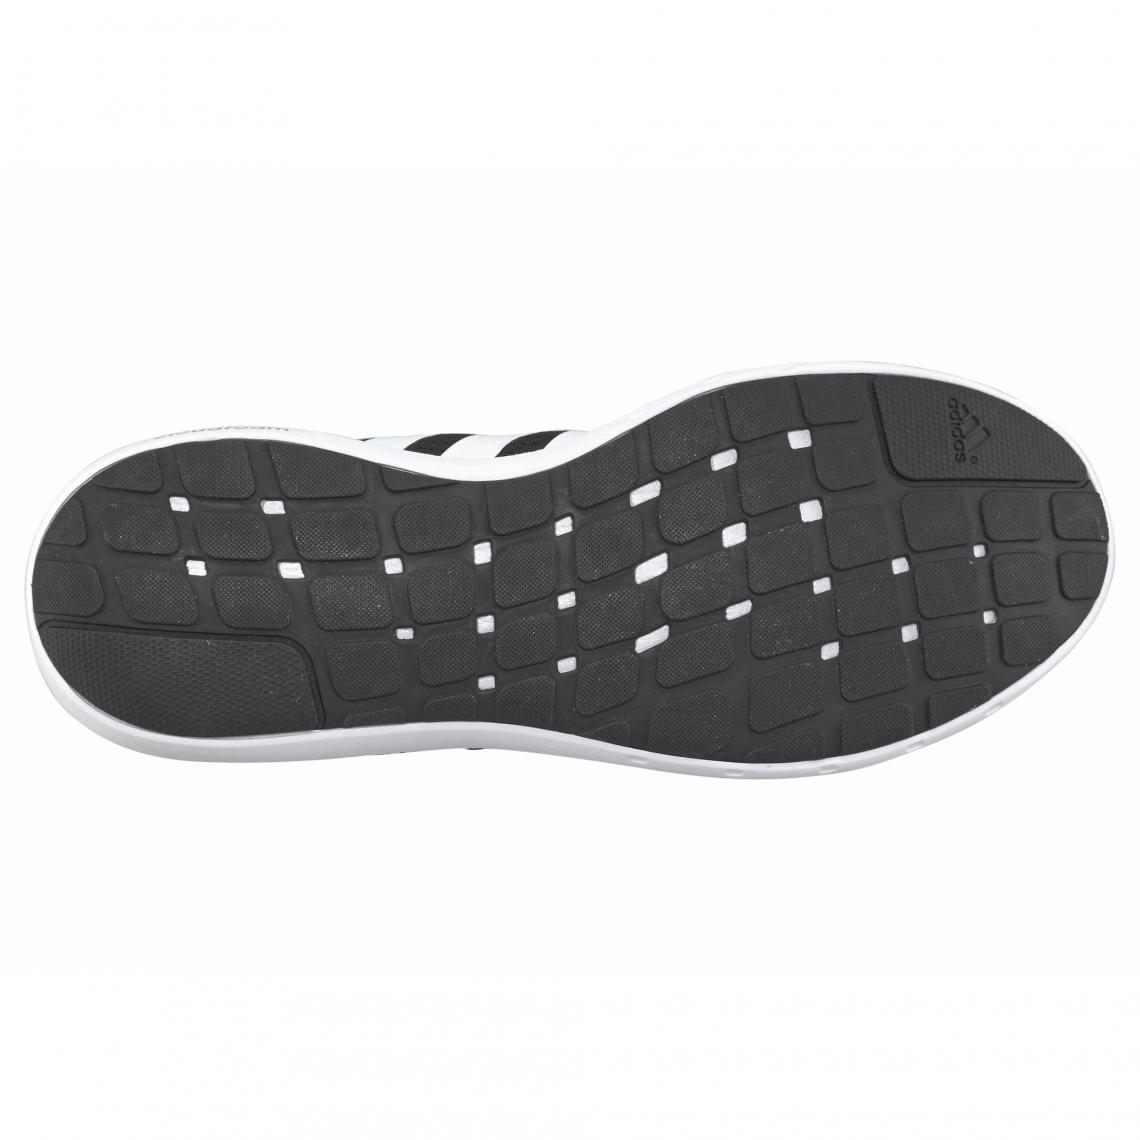 f47a07d44f adidas Performance Element Refresh chaussures de running homme - Noir - Blanc  Adidas Performance